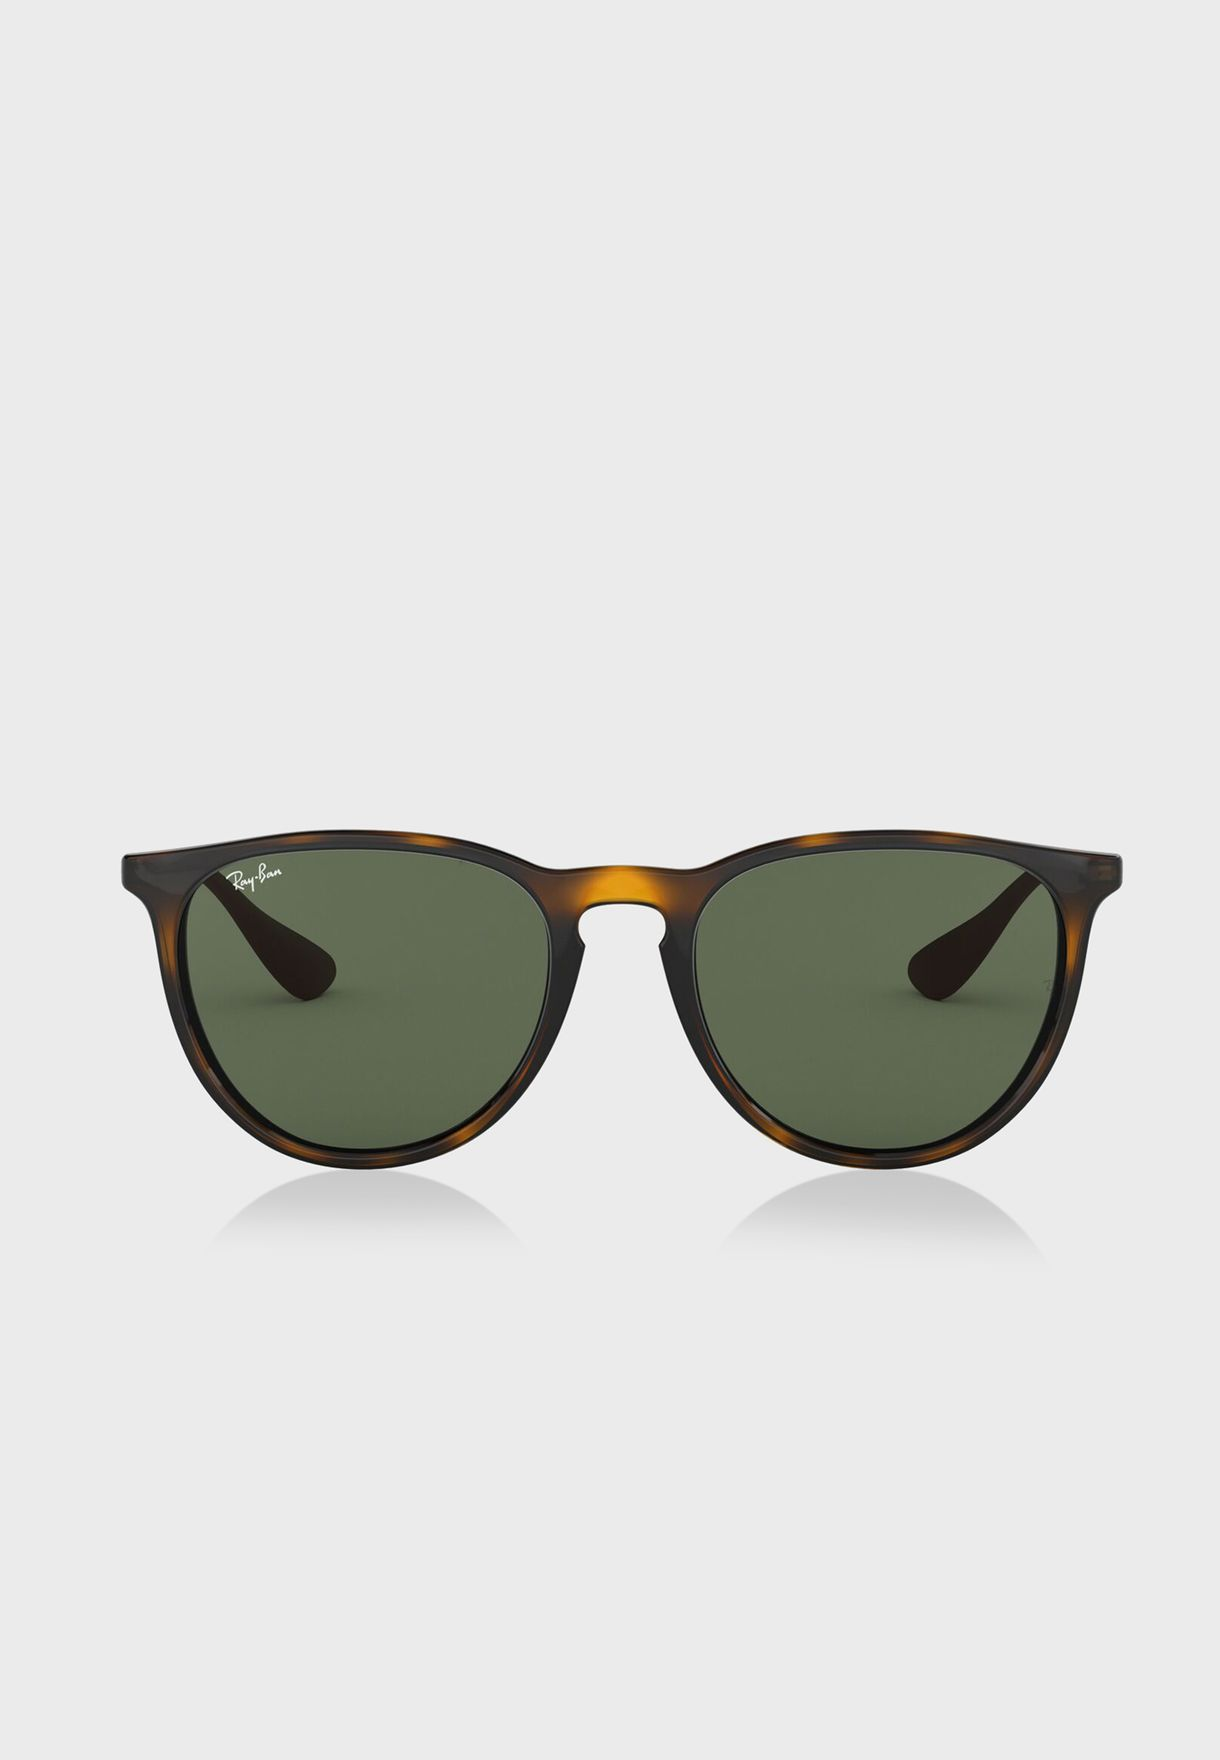 0Rb4171 Round Sunglasses